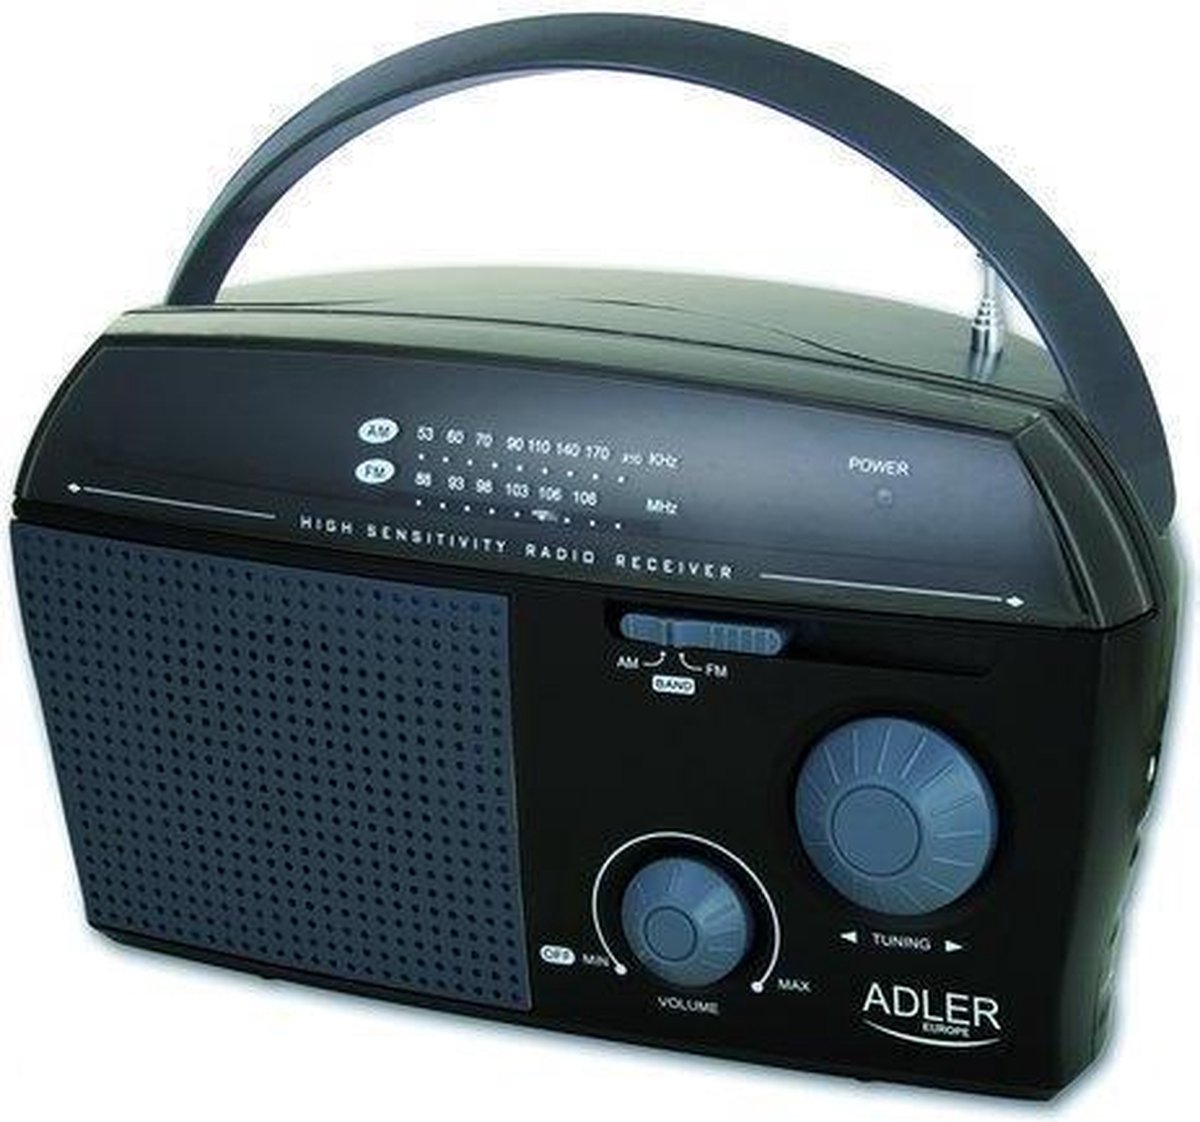 Adler AD1119 draagbare radio